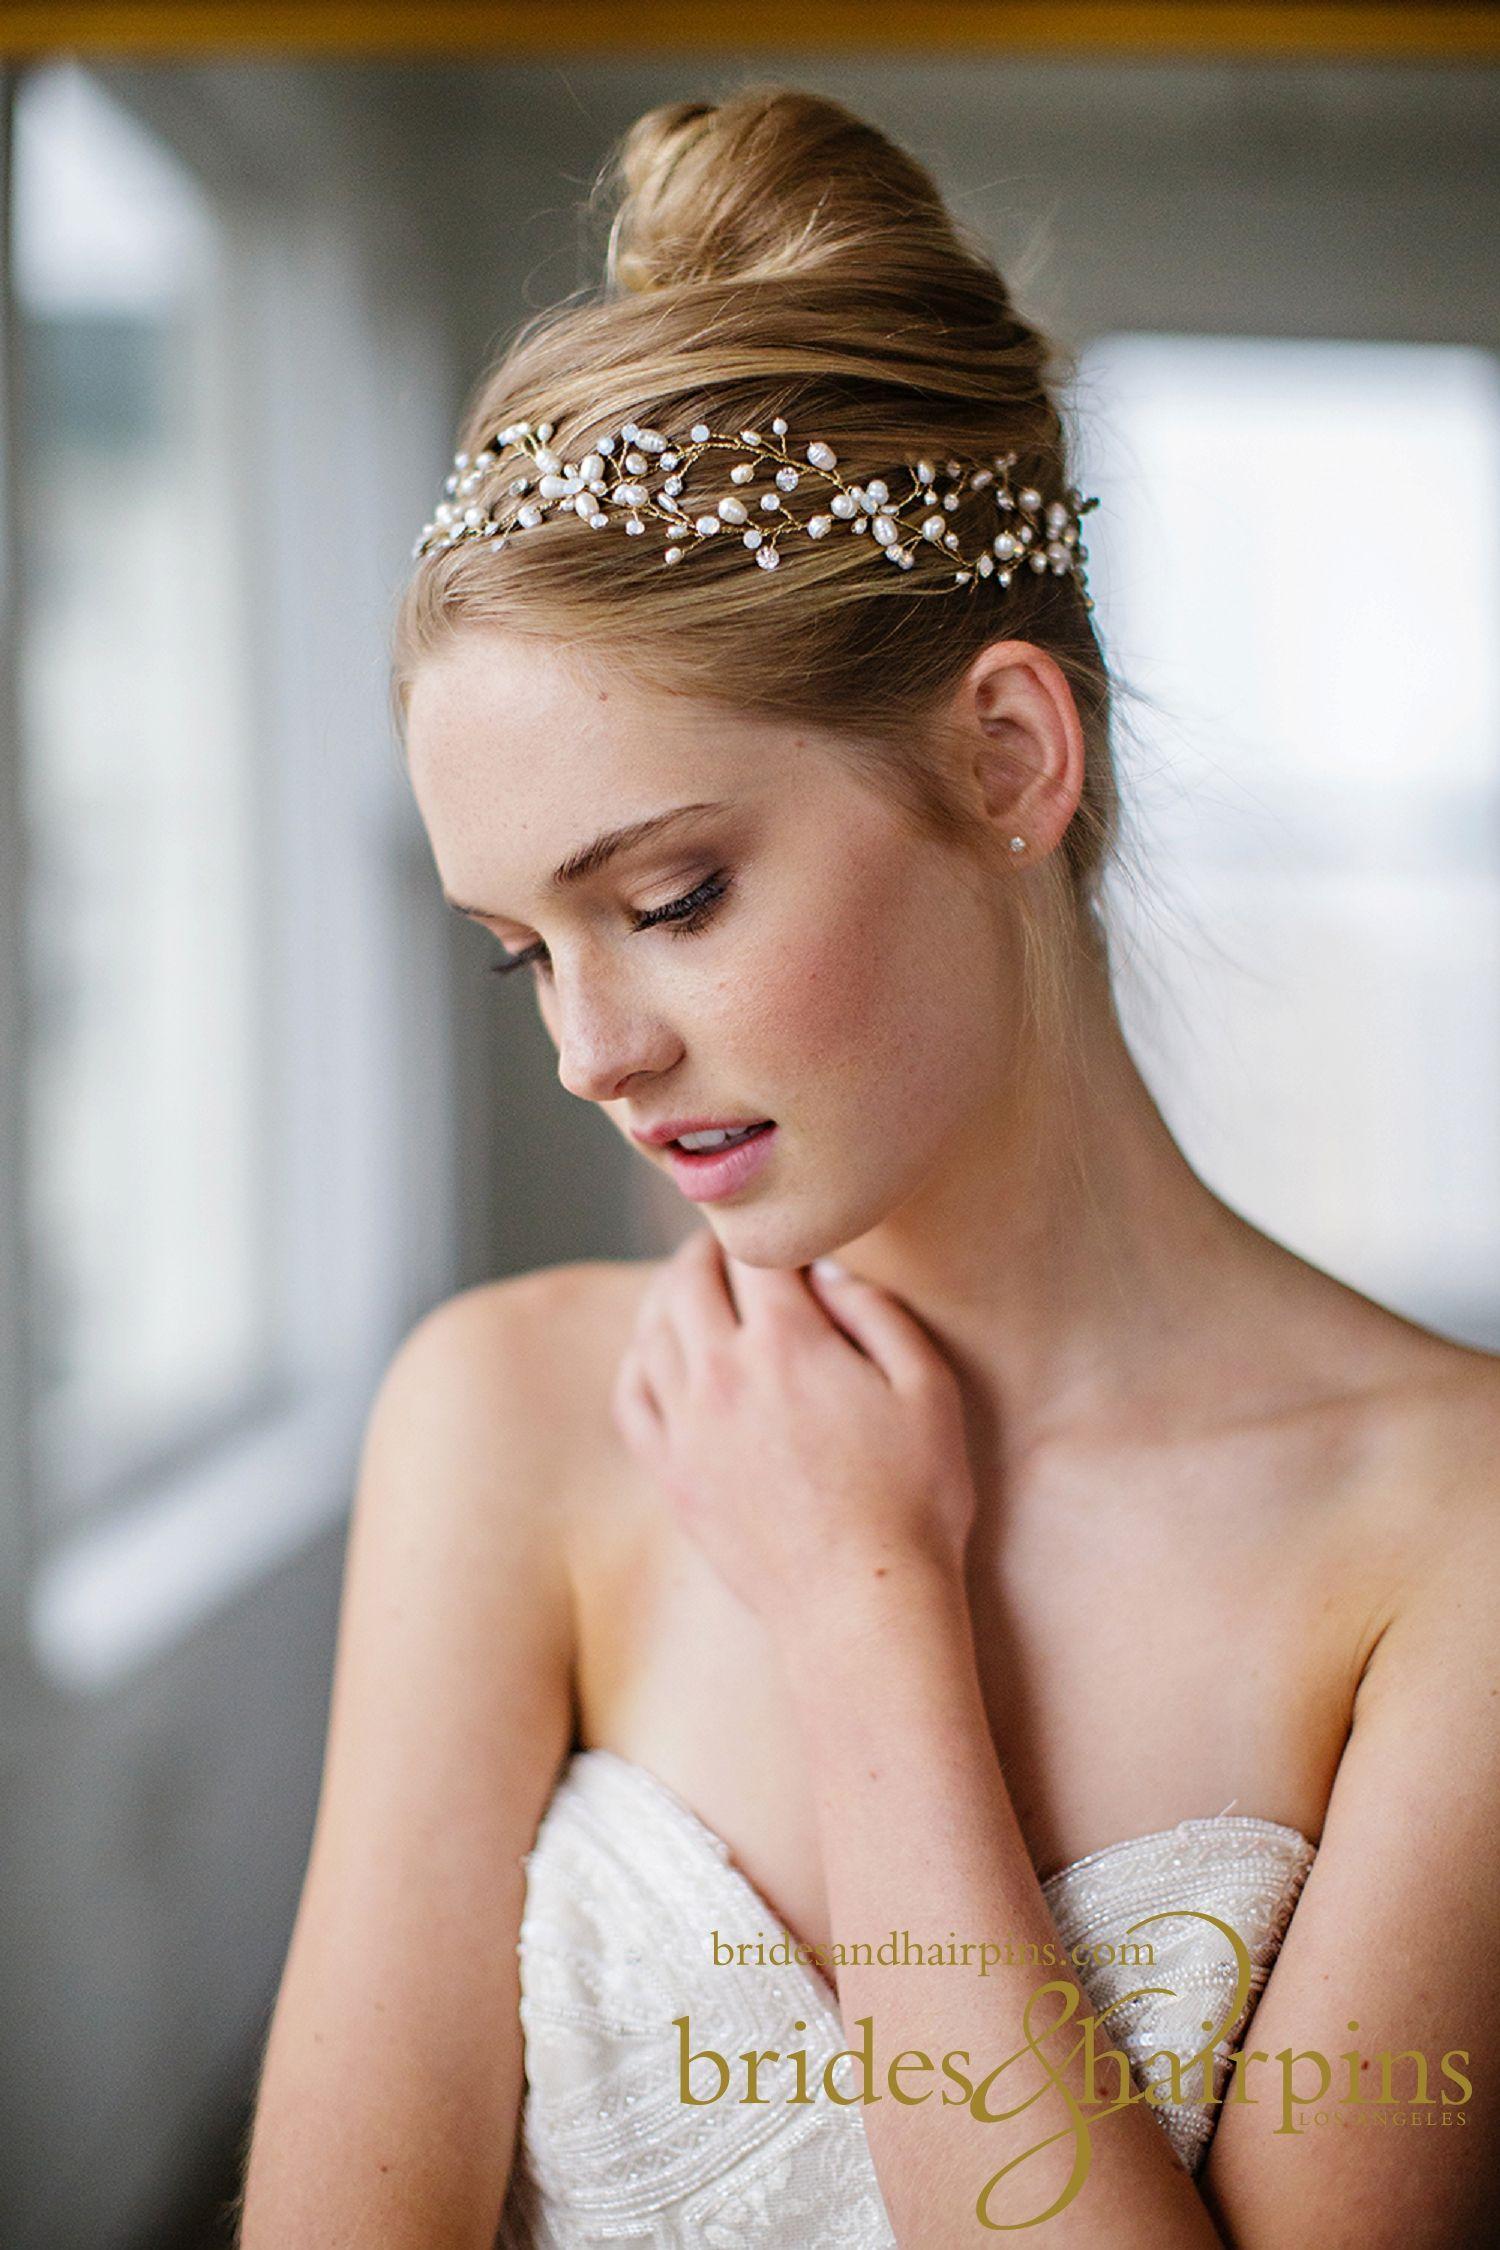 brides & hairpins - bridal hair accessories and veils